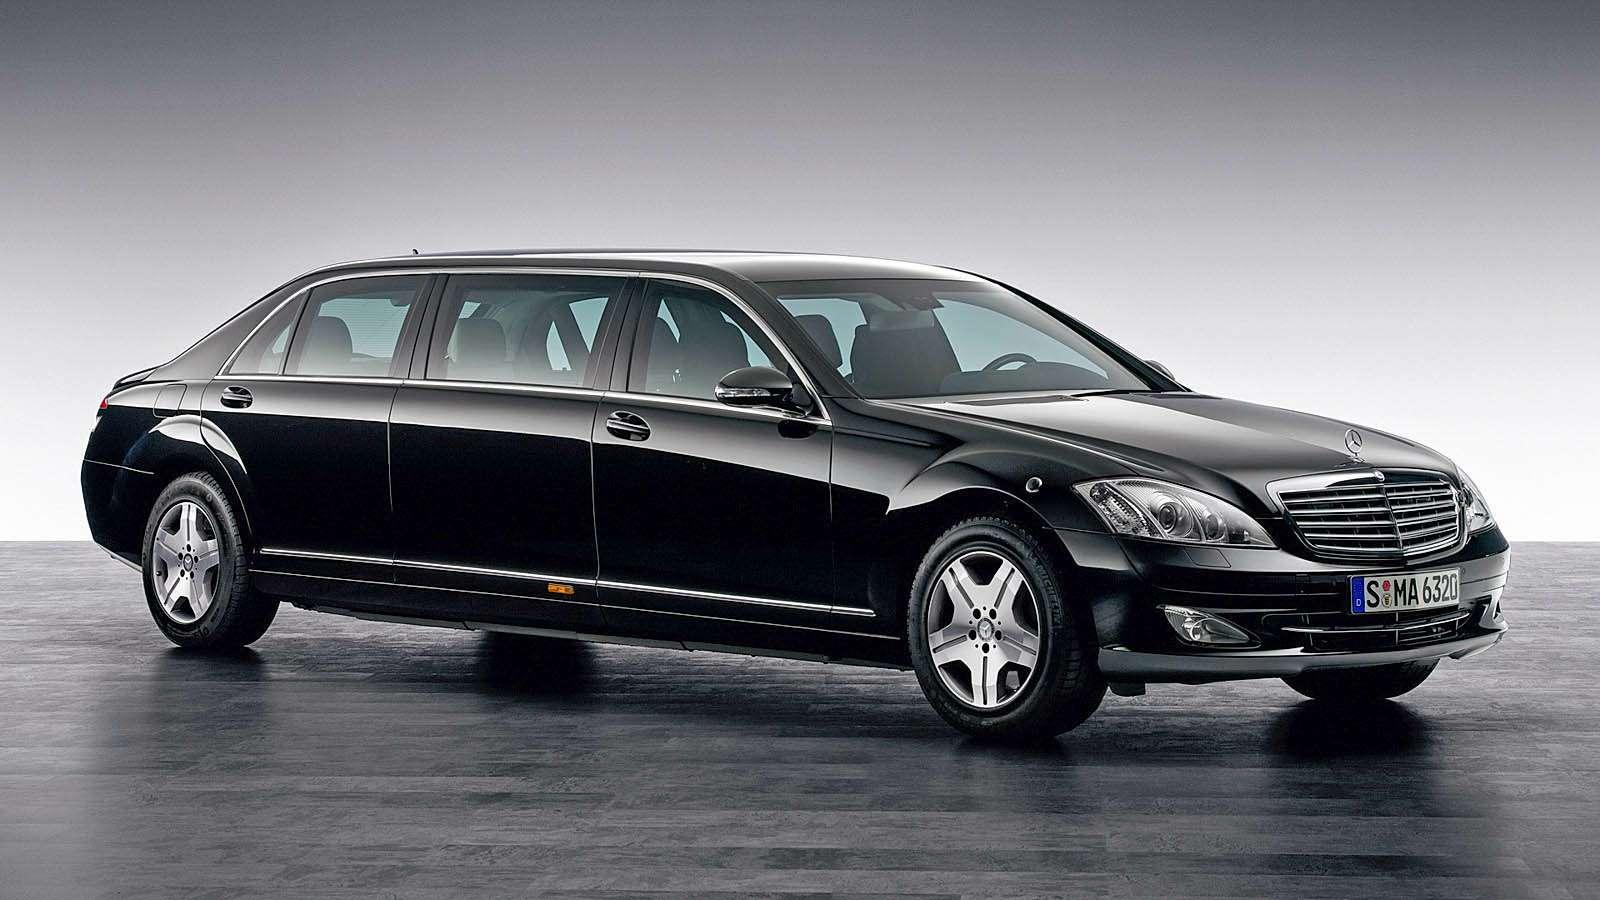 Броневик Mercedes-Benz S600 Pullman Guard